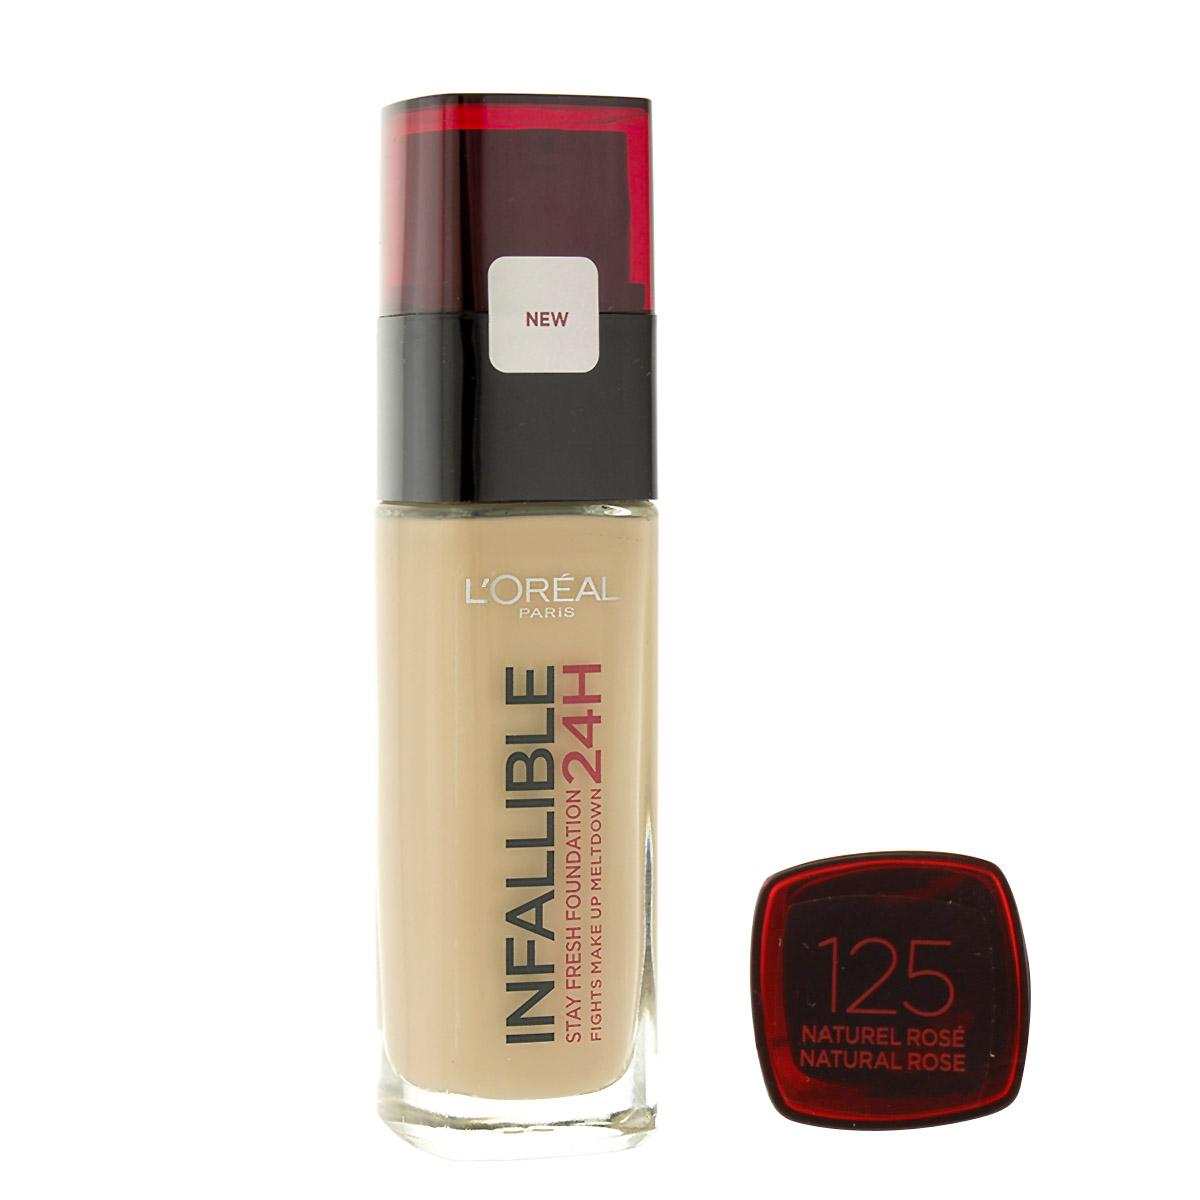 L´Oreal Paris Infallible 24H make-up (125 Natural Rose) 30 ml